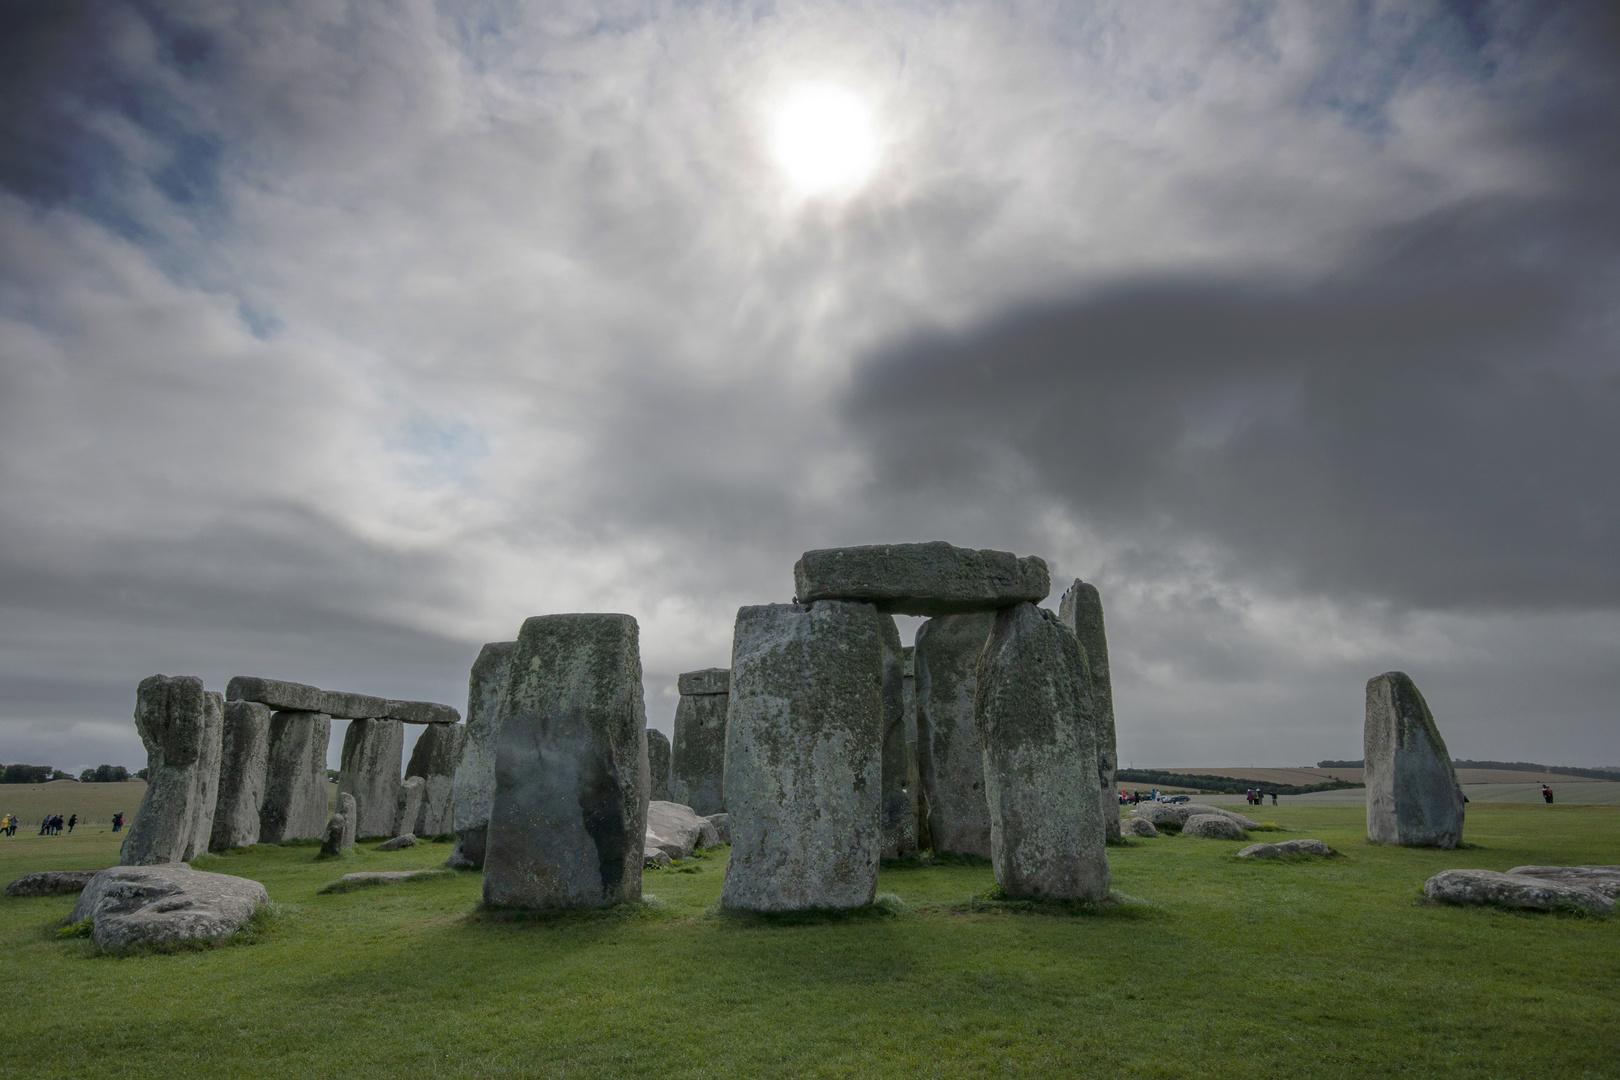 Stones Against a Backlit Sky